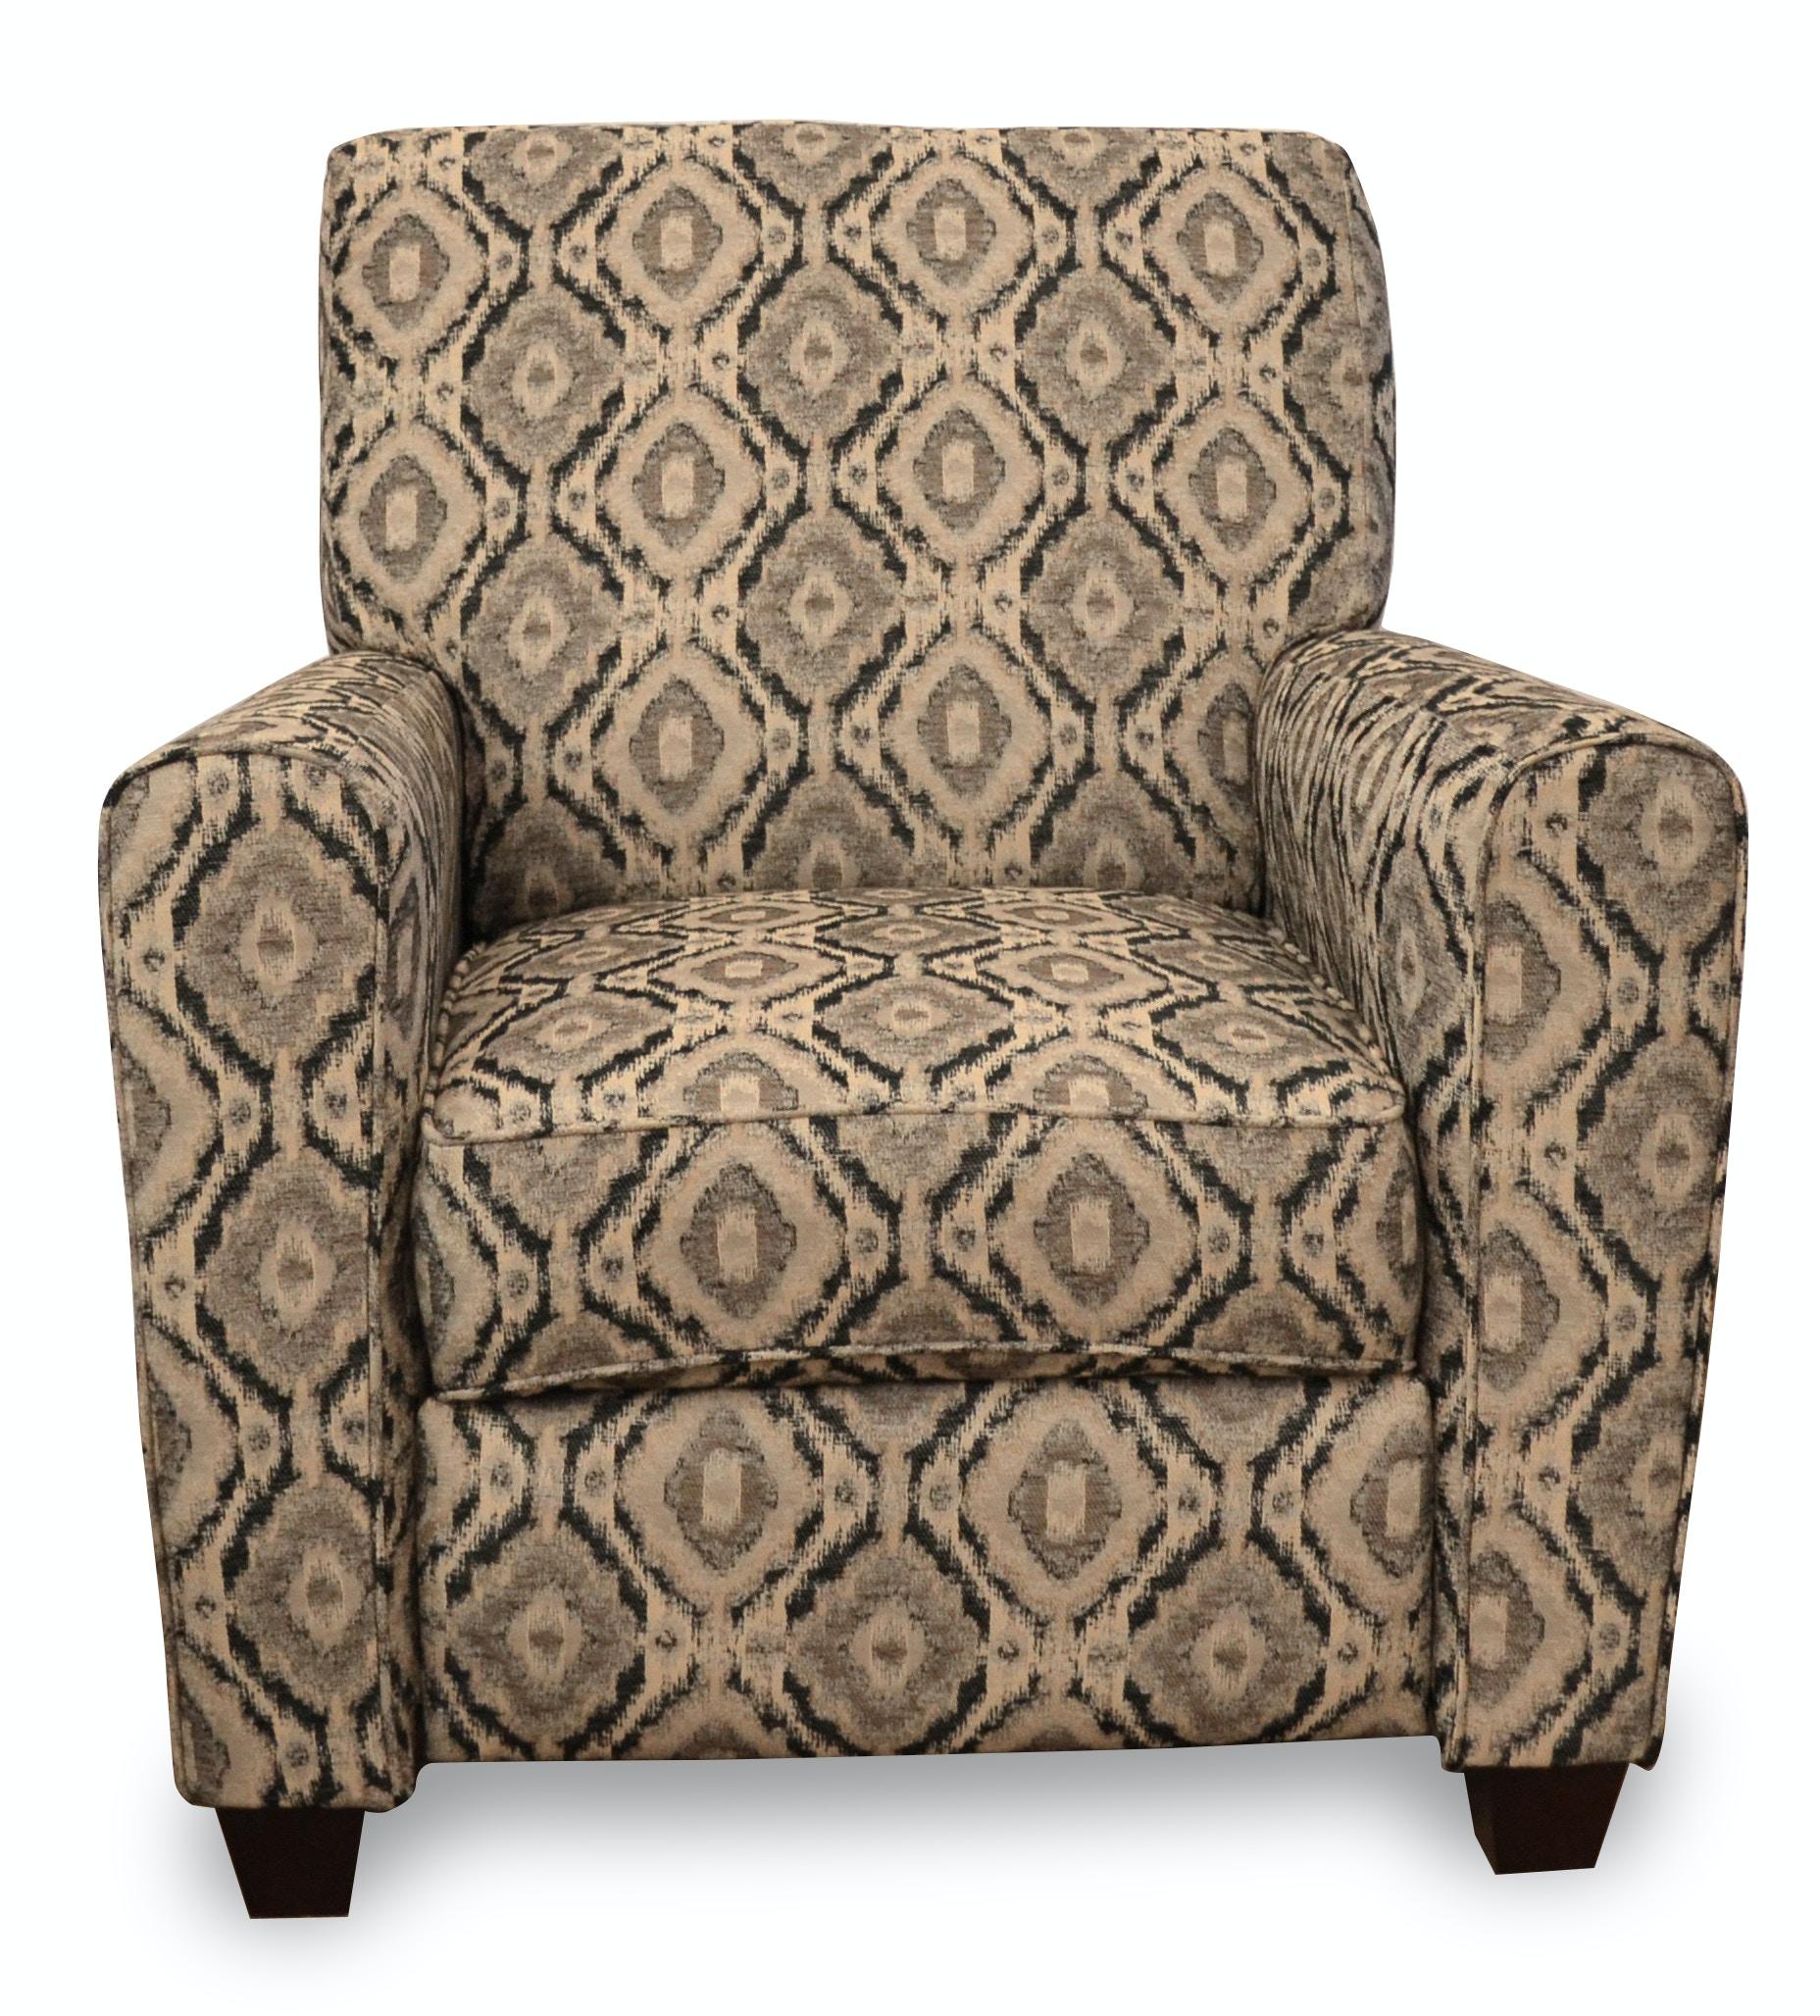 Republic Living Room Simon Chofa Pewter 528103 Kittle